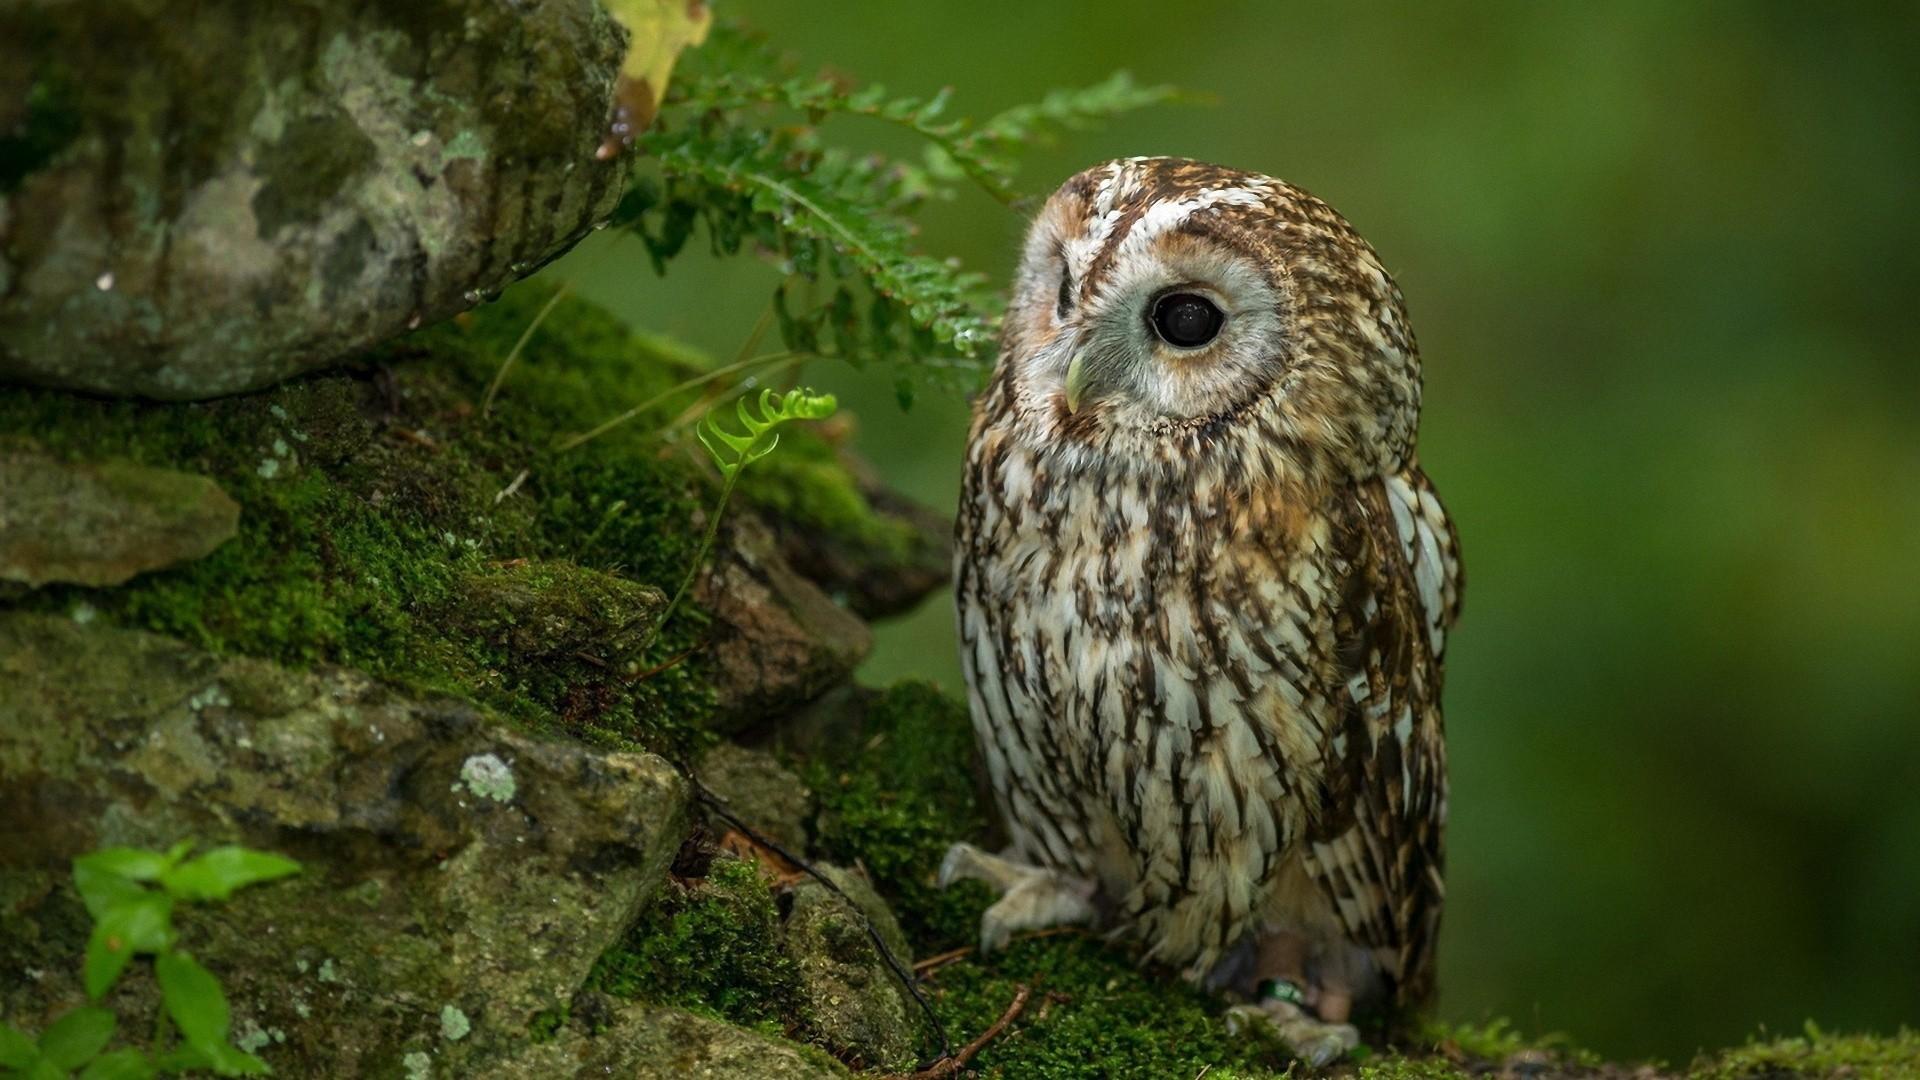 Owl Wallpaper HD 2561